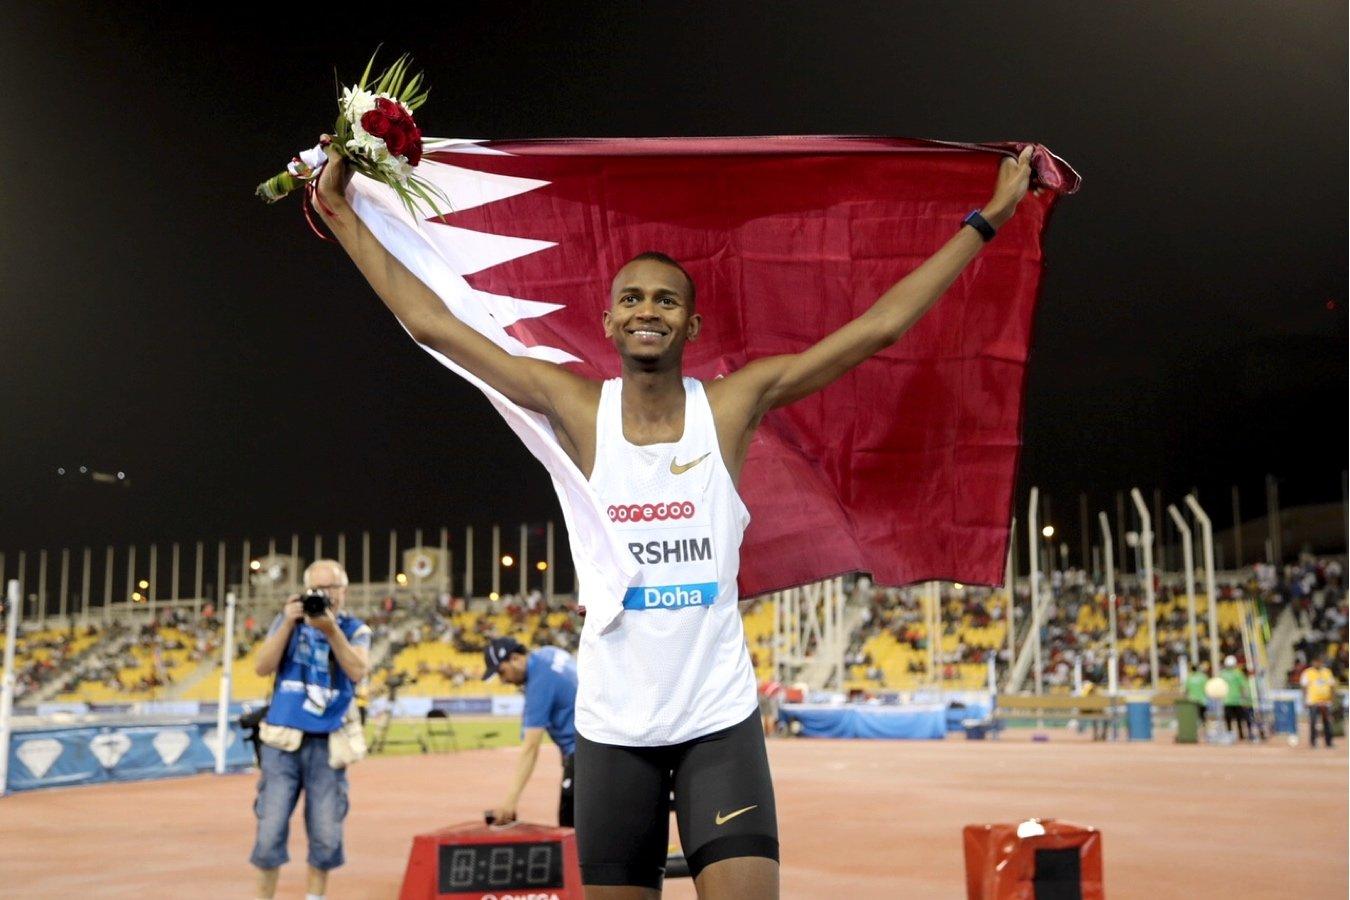 Mutaz Barshim (QAT) at the Doha 2018 IAAF Diamond League meeting © Hasse Sjögren